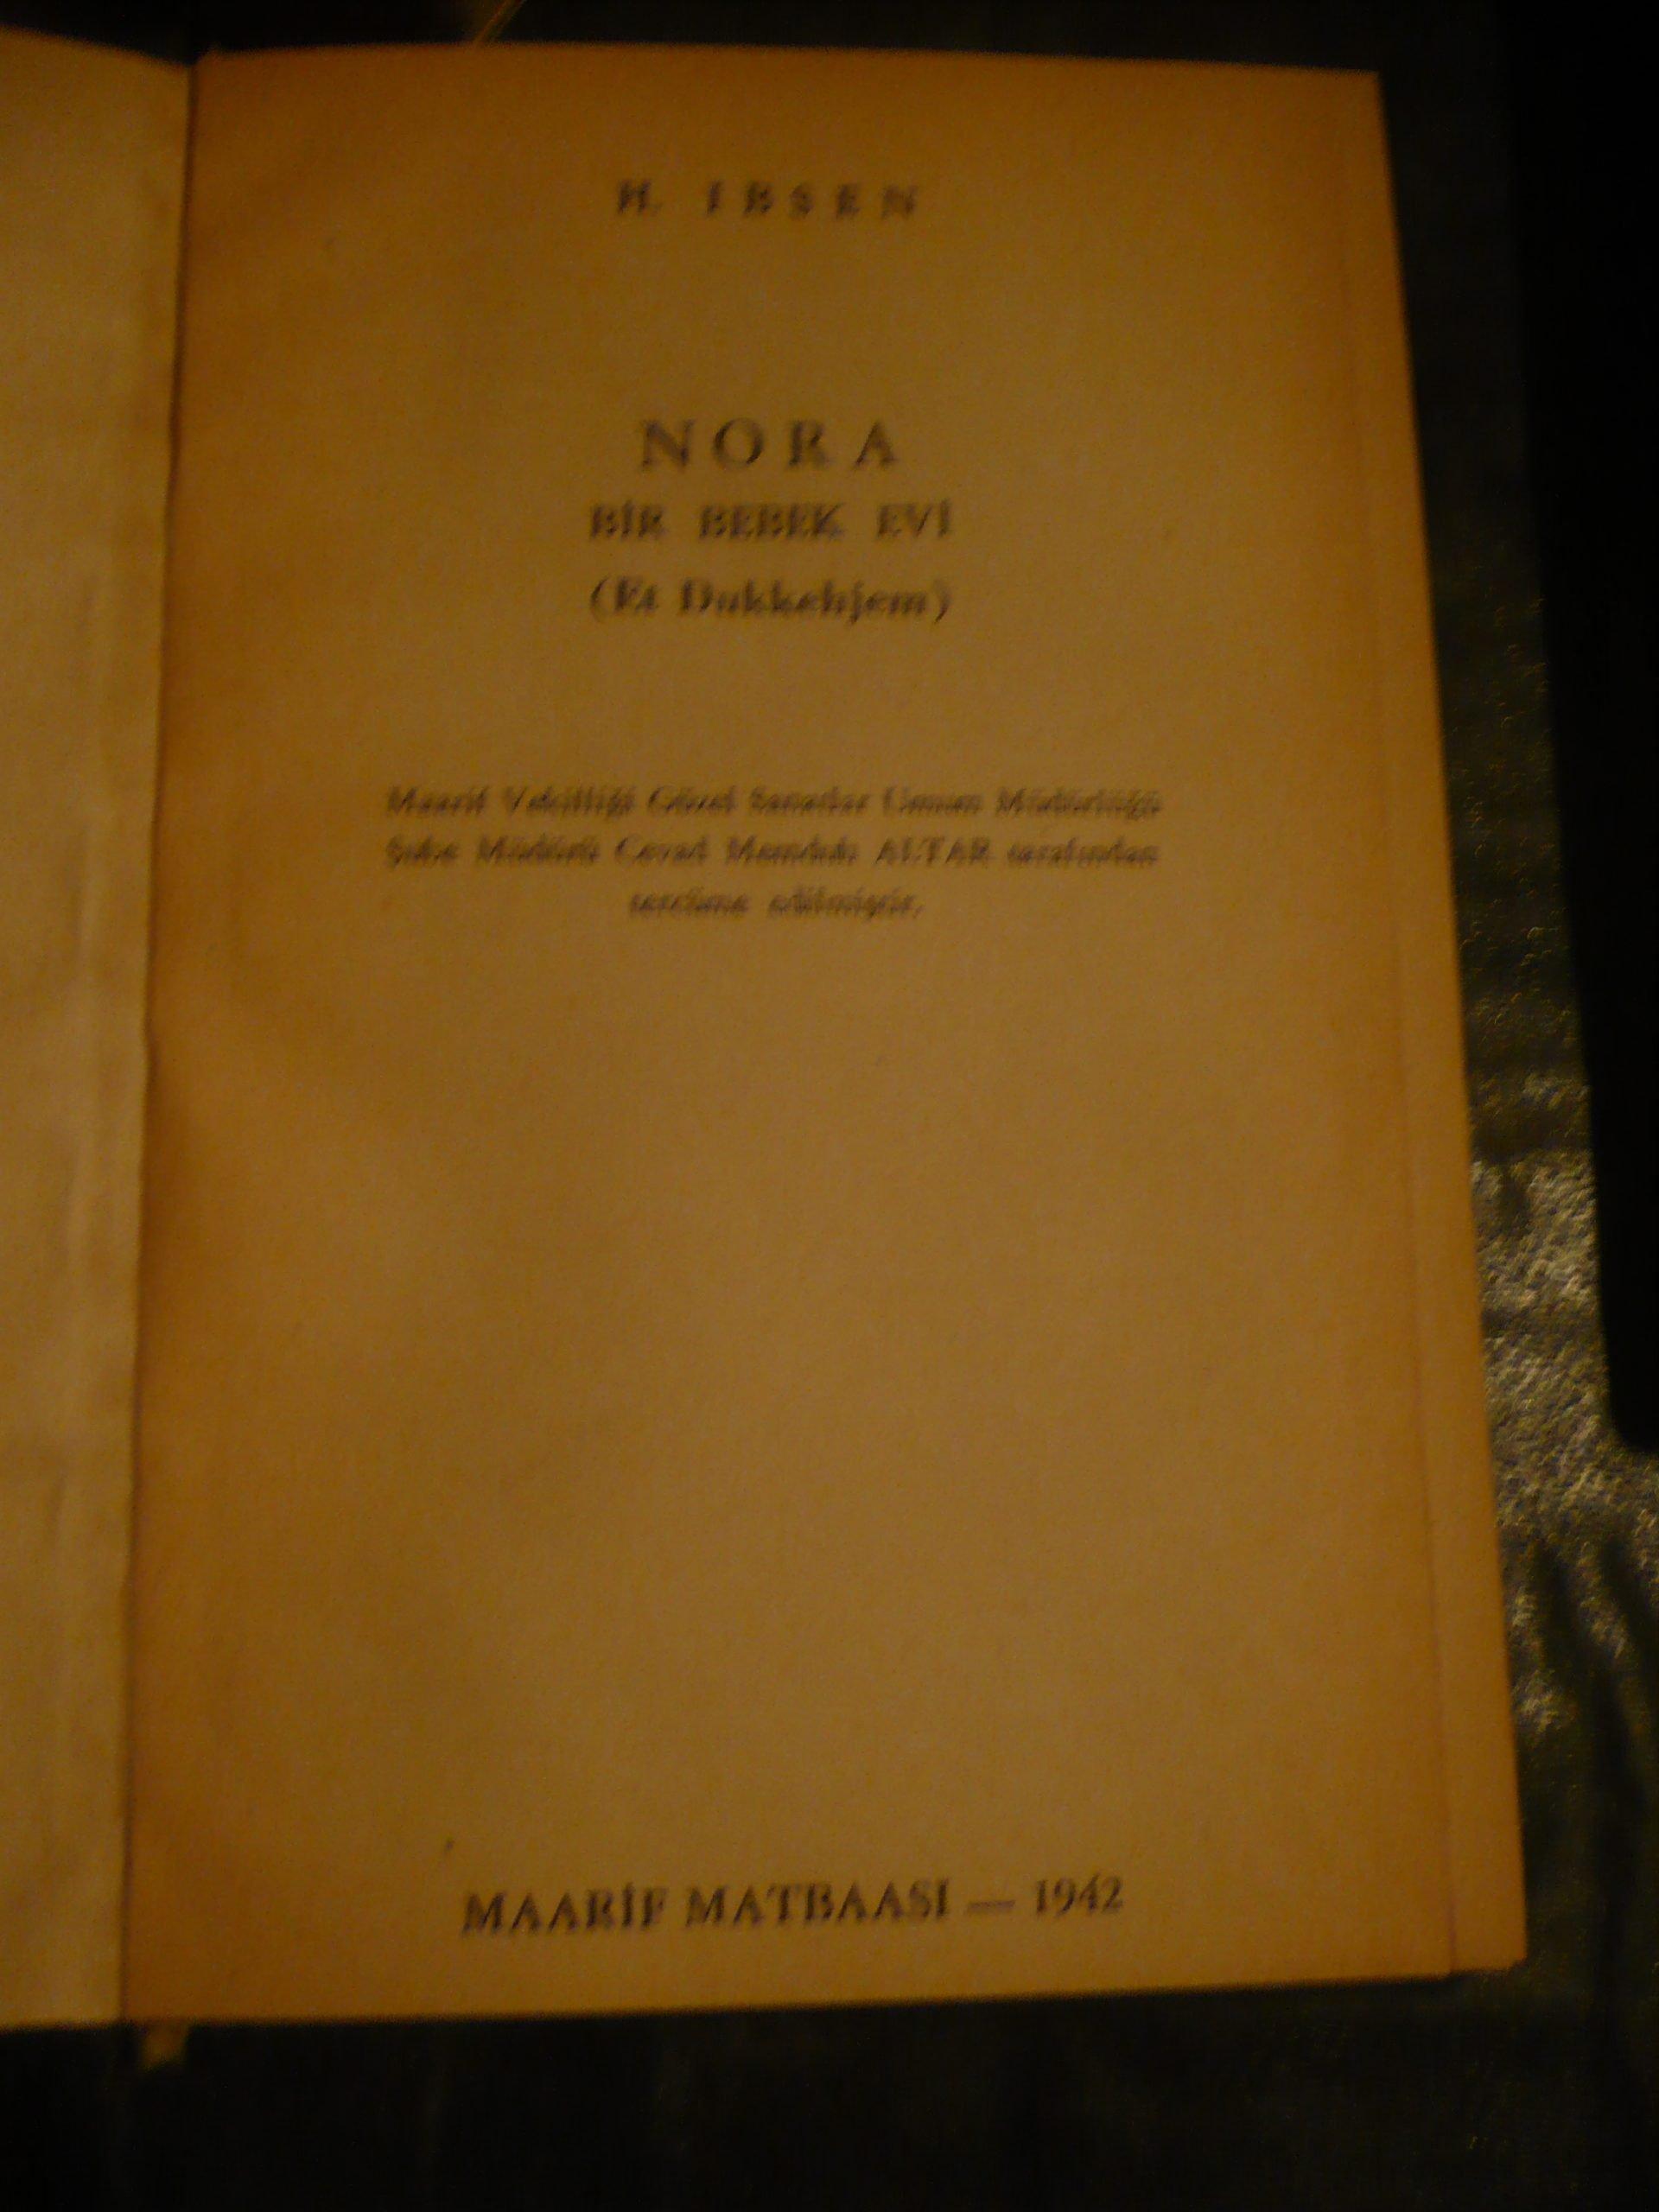 NORA /Bir bebek evi/H.IBSEN/1942 BASIM